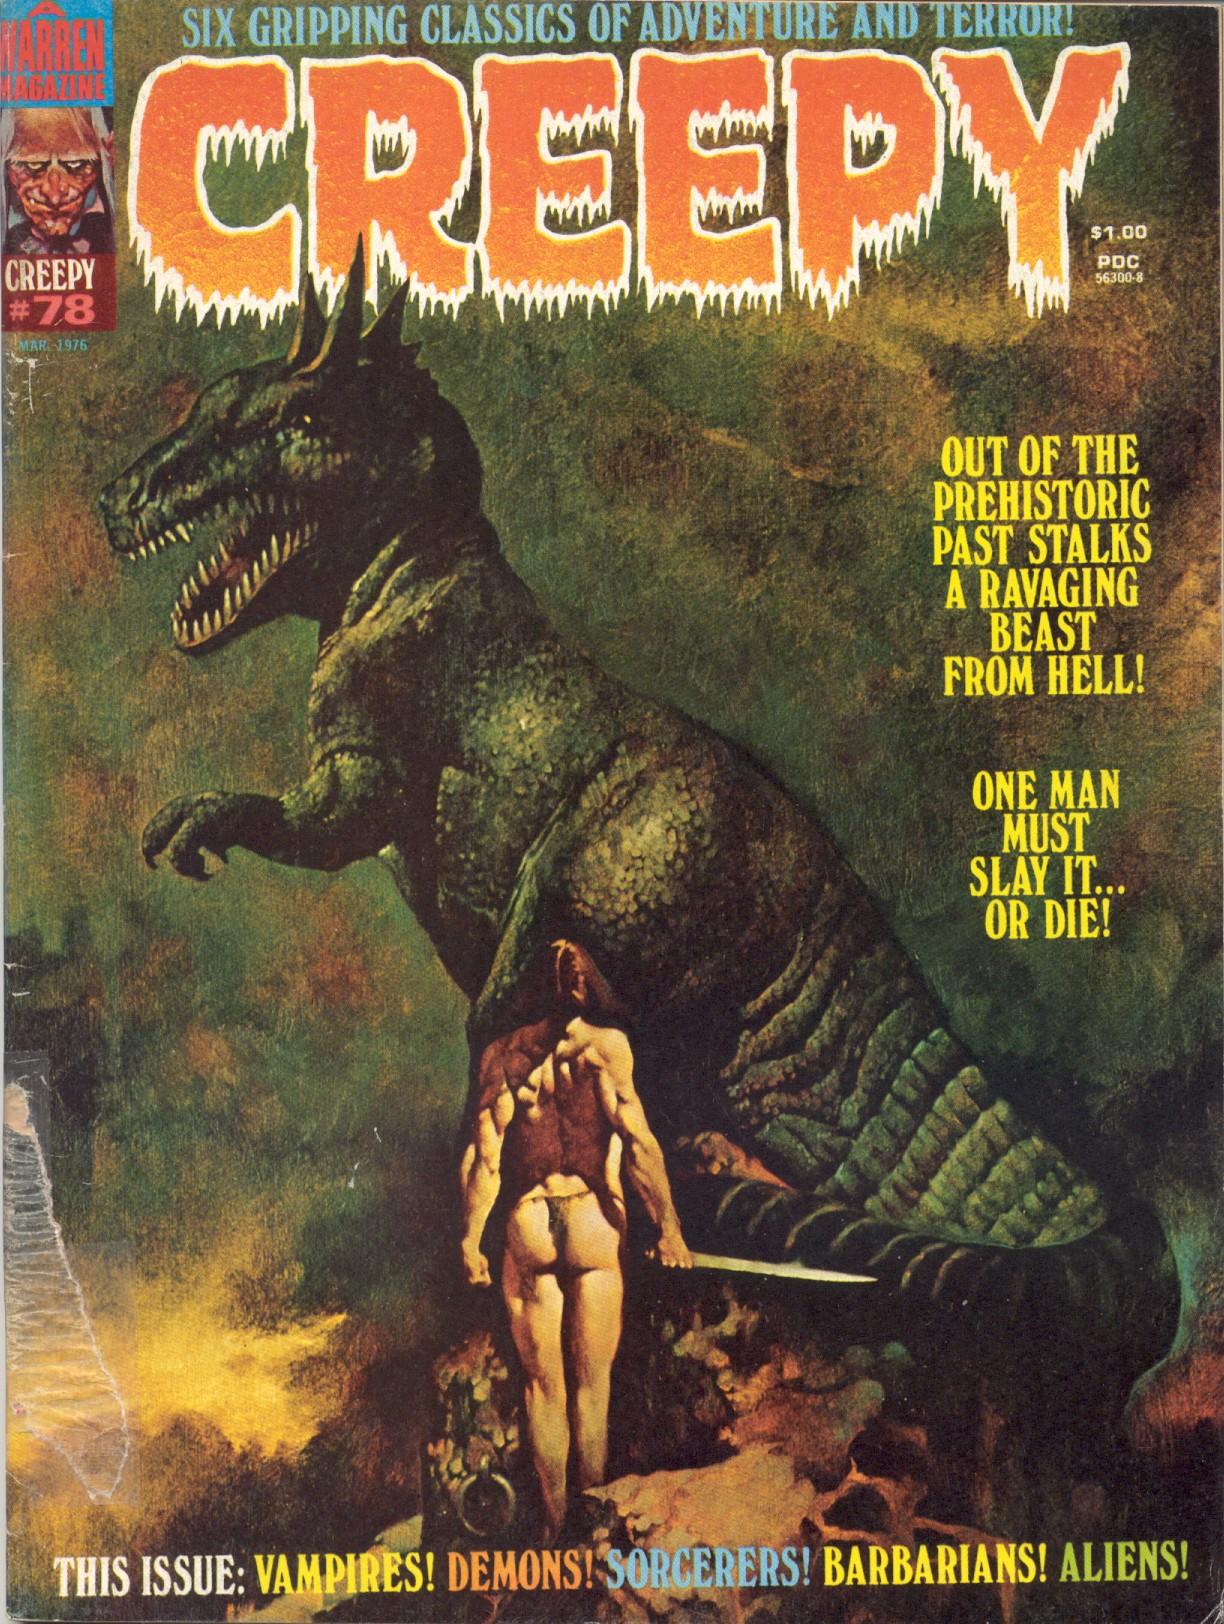 Creepy (1964) 78 Page 1